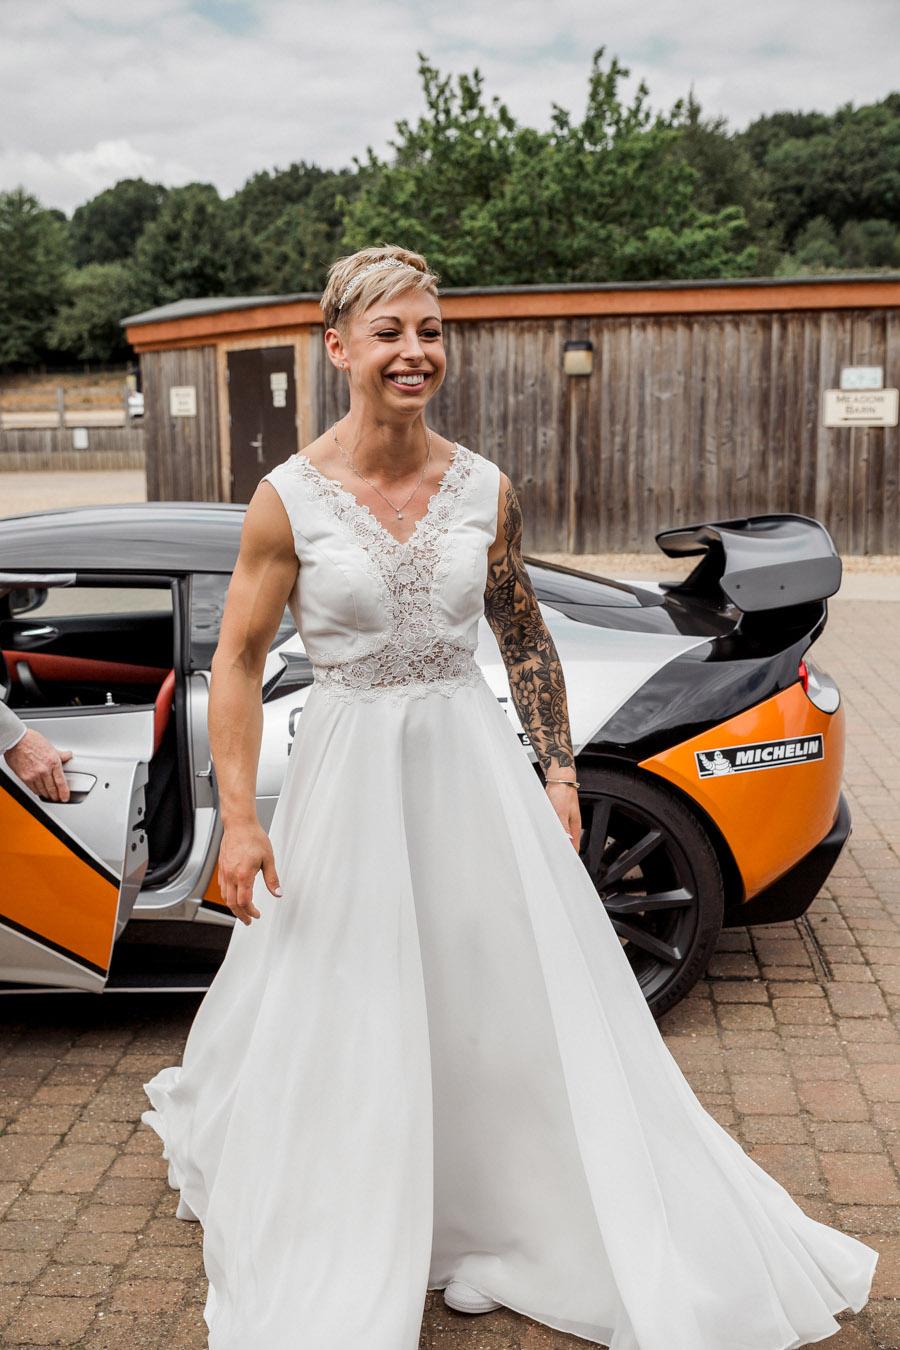 Tewin Bury farm wedding blog, photo credit Absolute Photo UK (9)